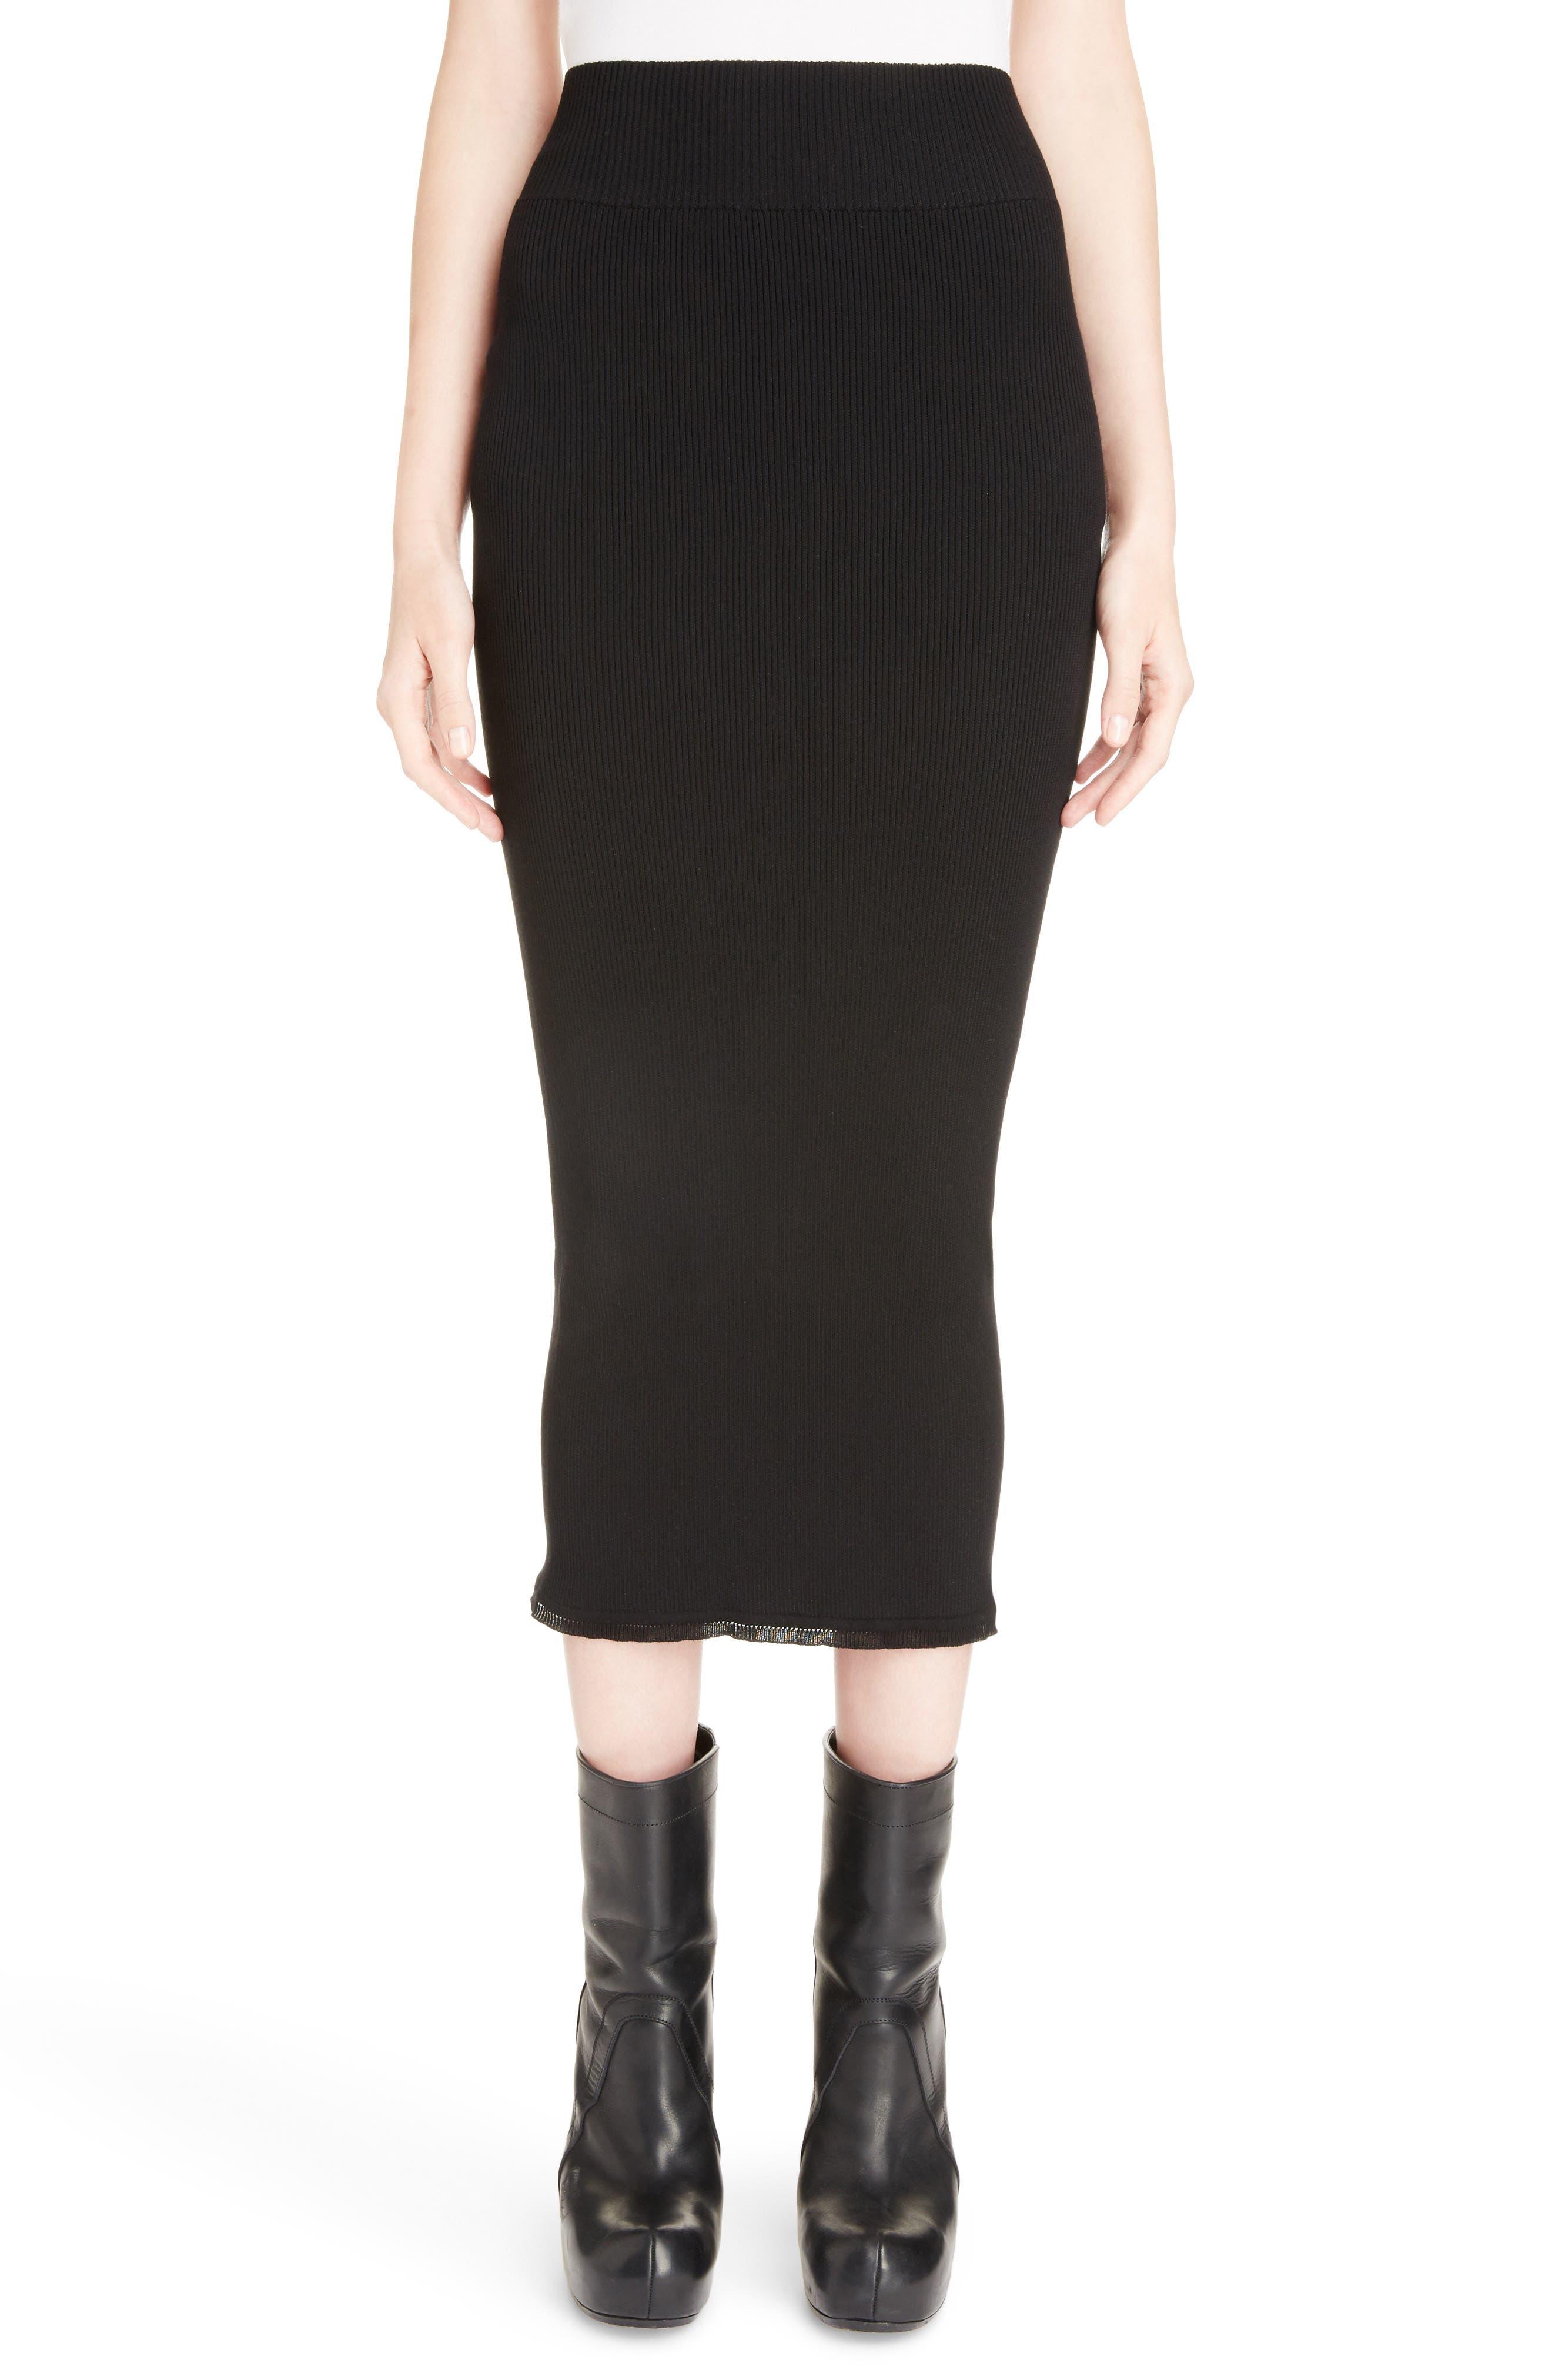 Alternate Image 1 Selected - Rick Owens Stretch Knit Midi Skirt